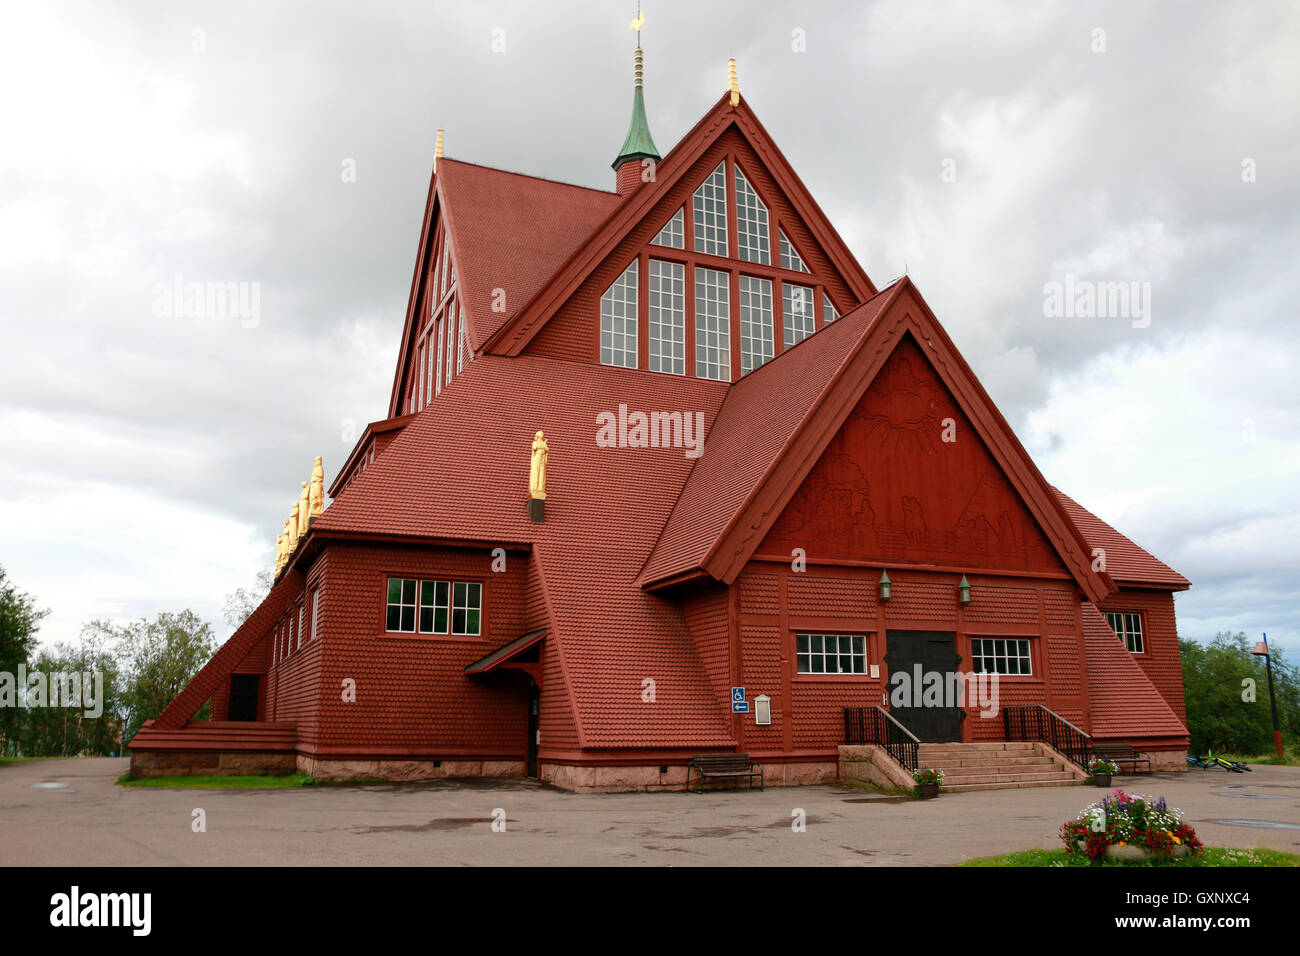 Impressionen: Kirche, Kiruna, Lappland, Schweden. - Stock Image